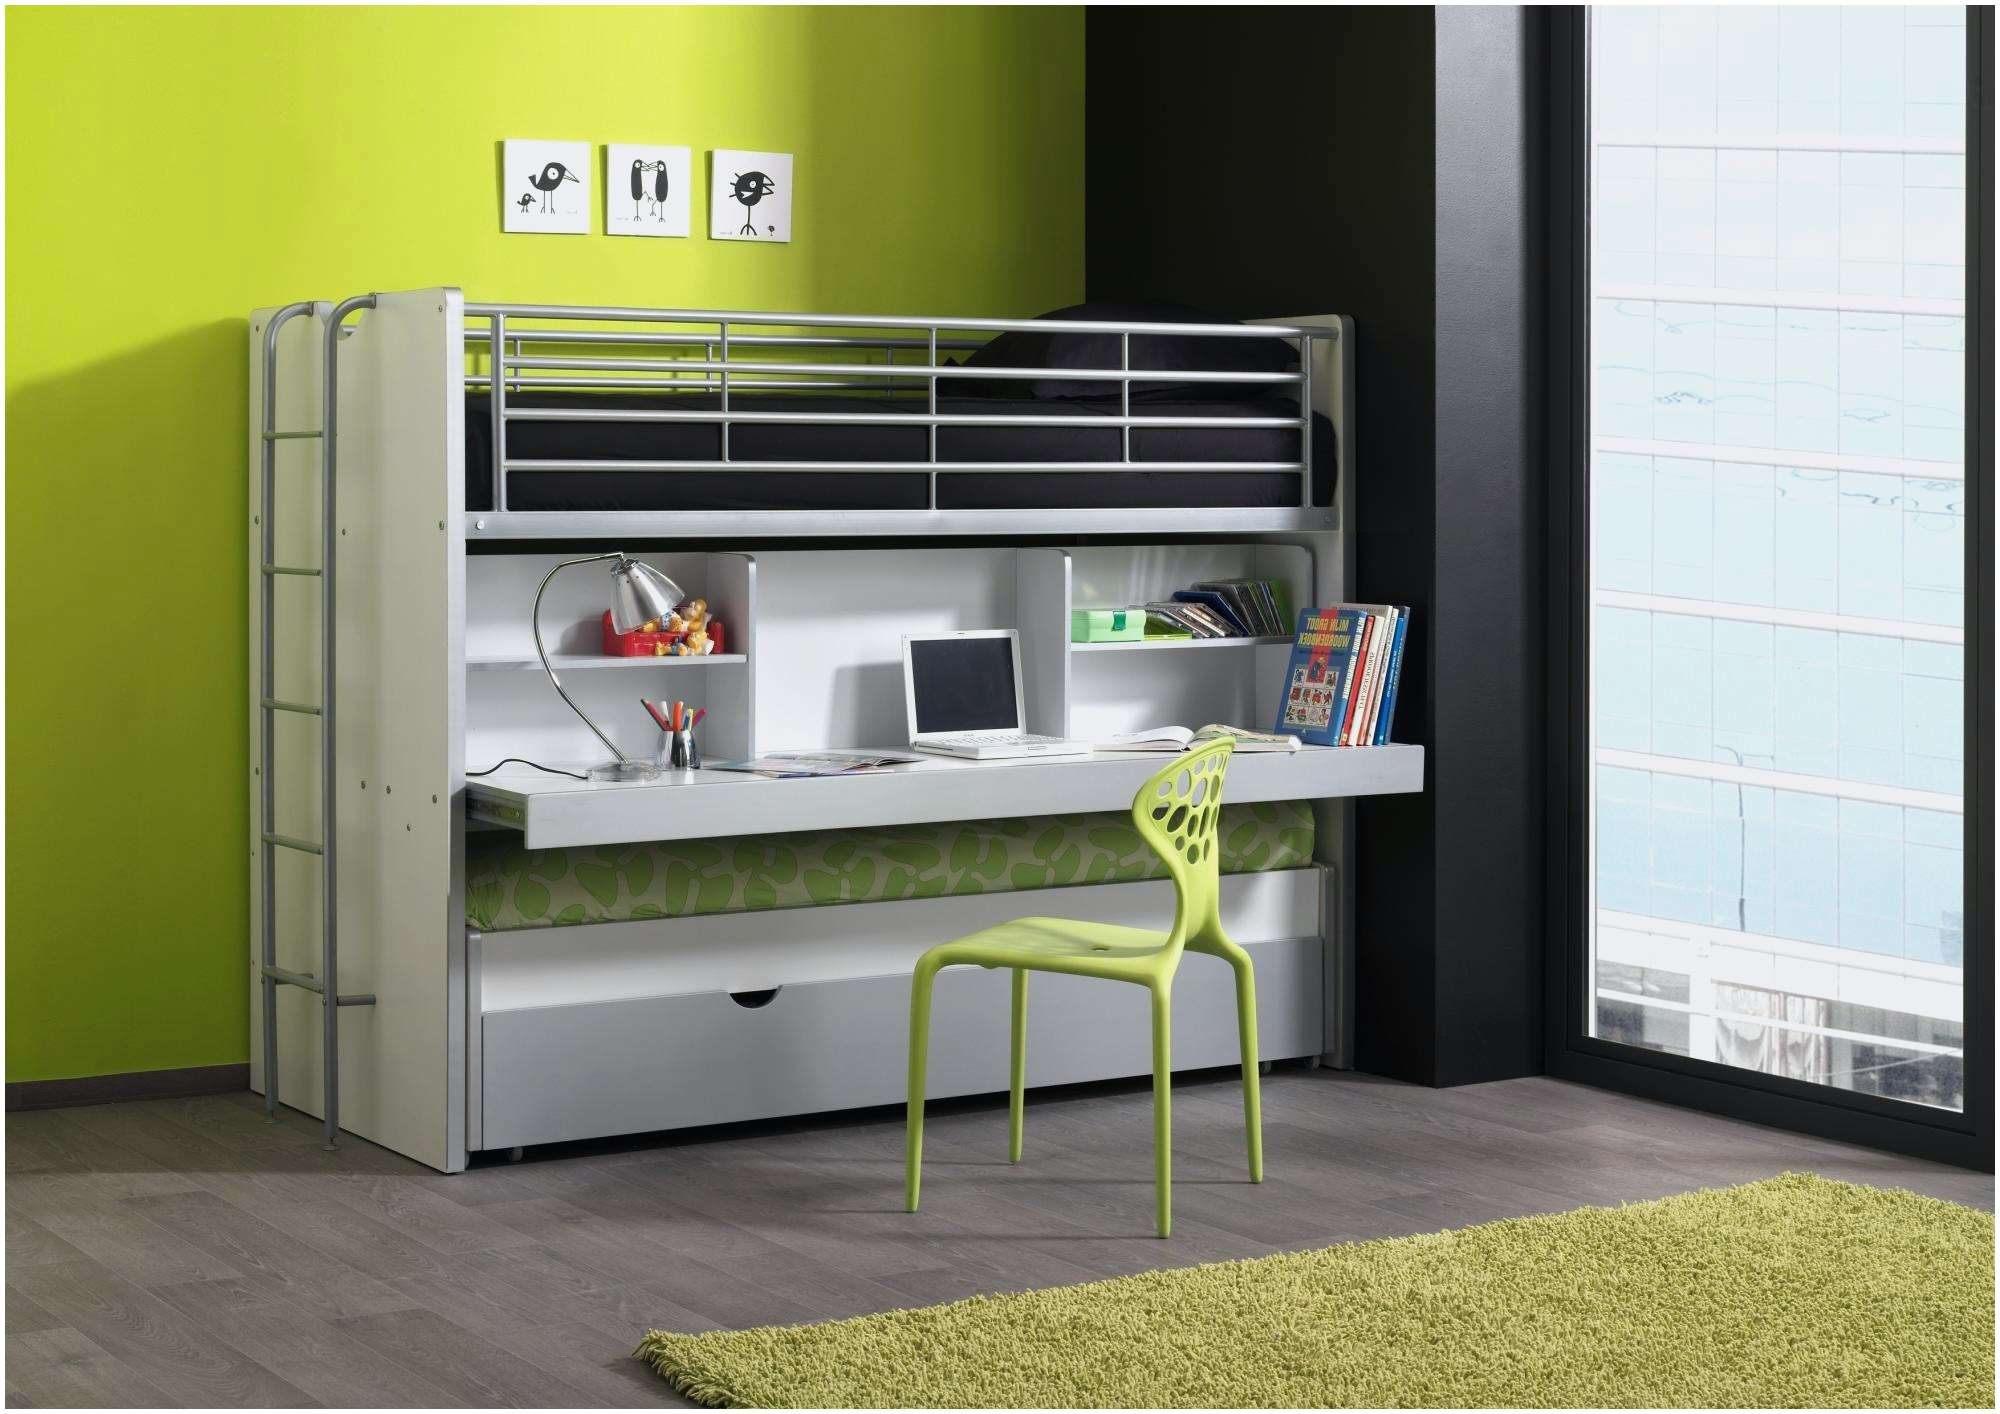 Lit Superposé 3 Couchages De Luxe 53 Lit Superposé Adulte Ikea Idee Jongor4hire